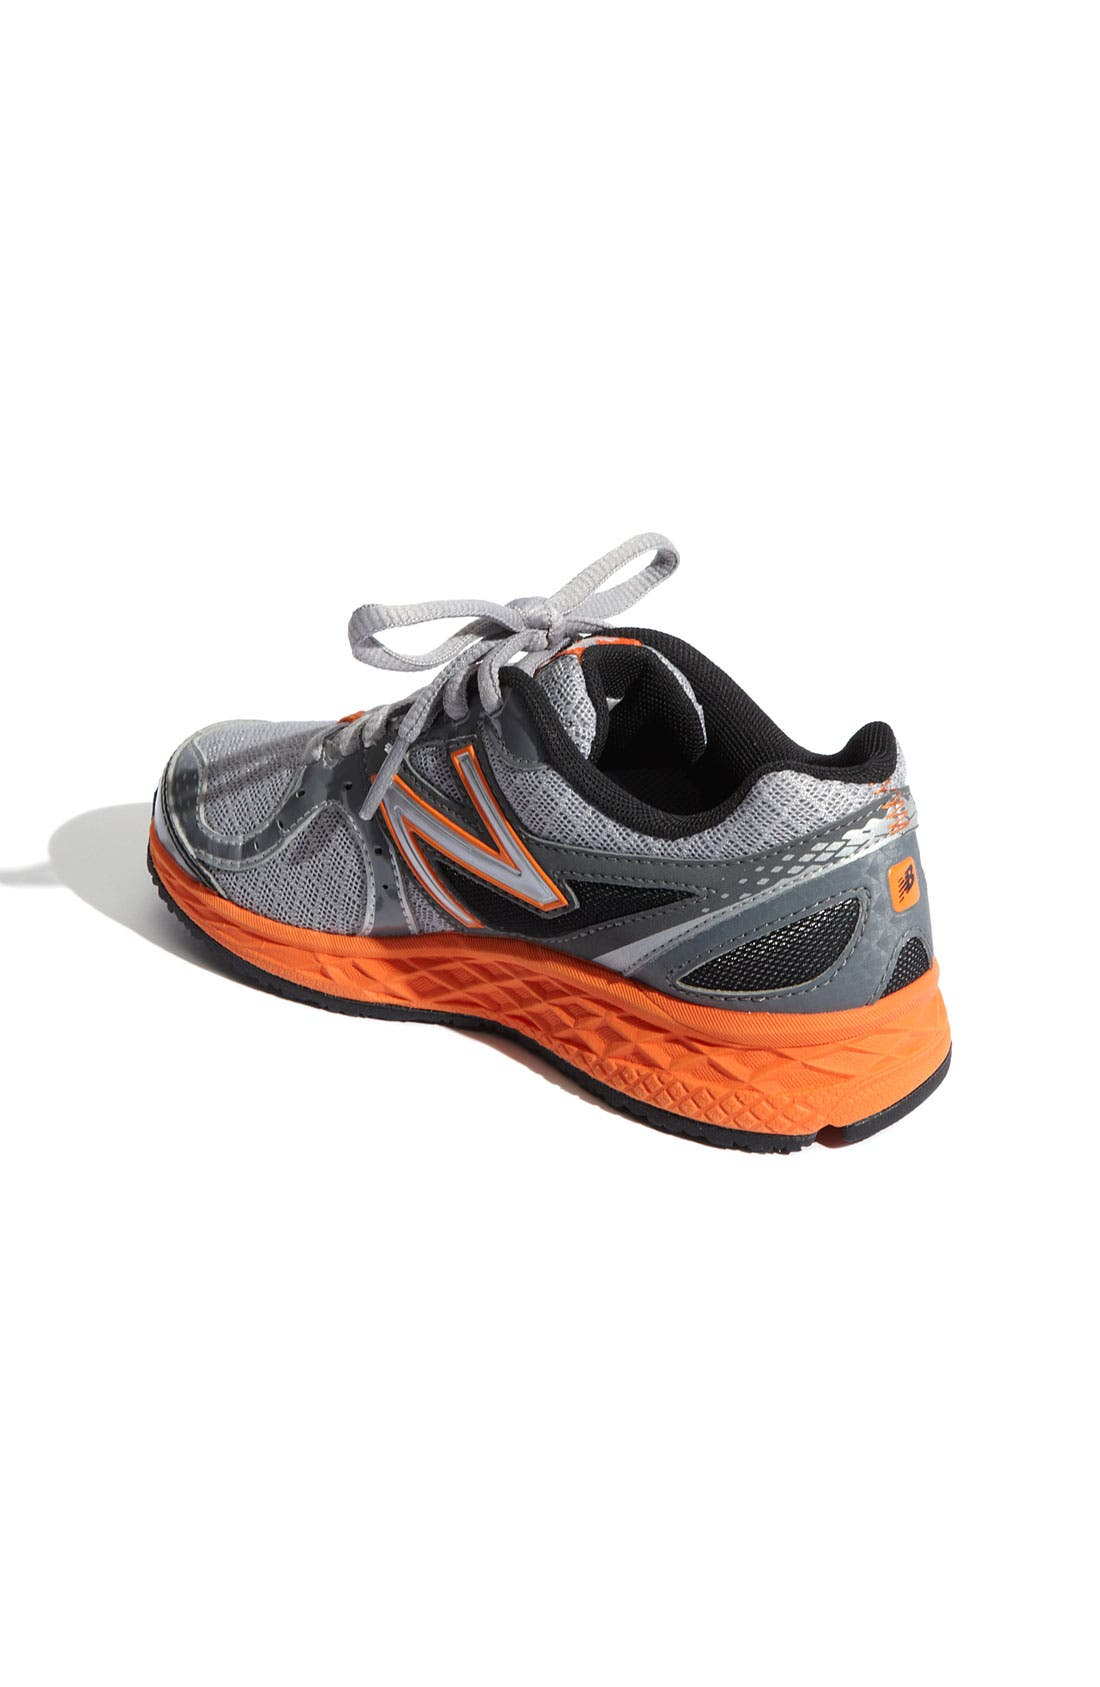 Alternate Image 2  - New Balance '790' Trail Running Shoe (Toddler, Little Kid & Big Kid)